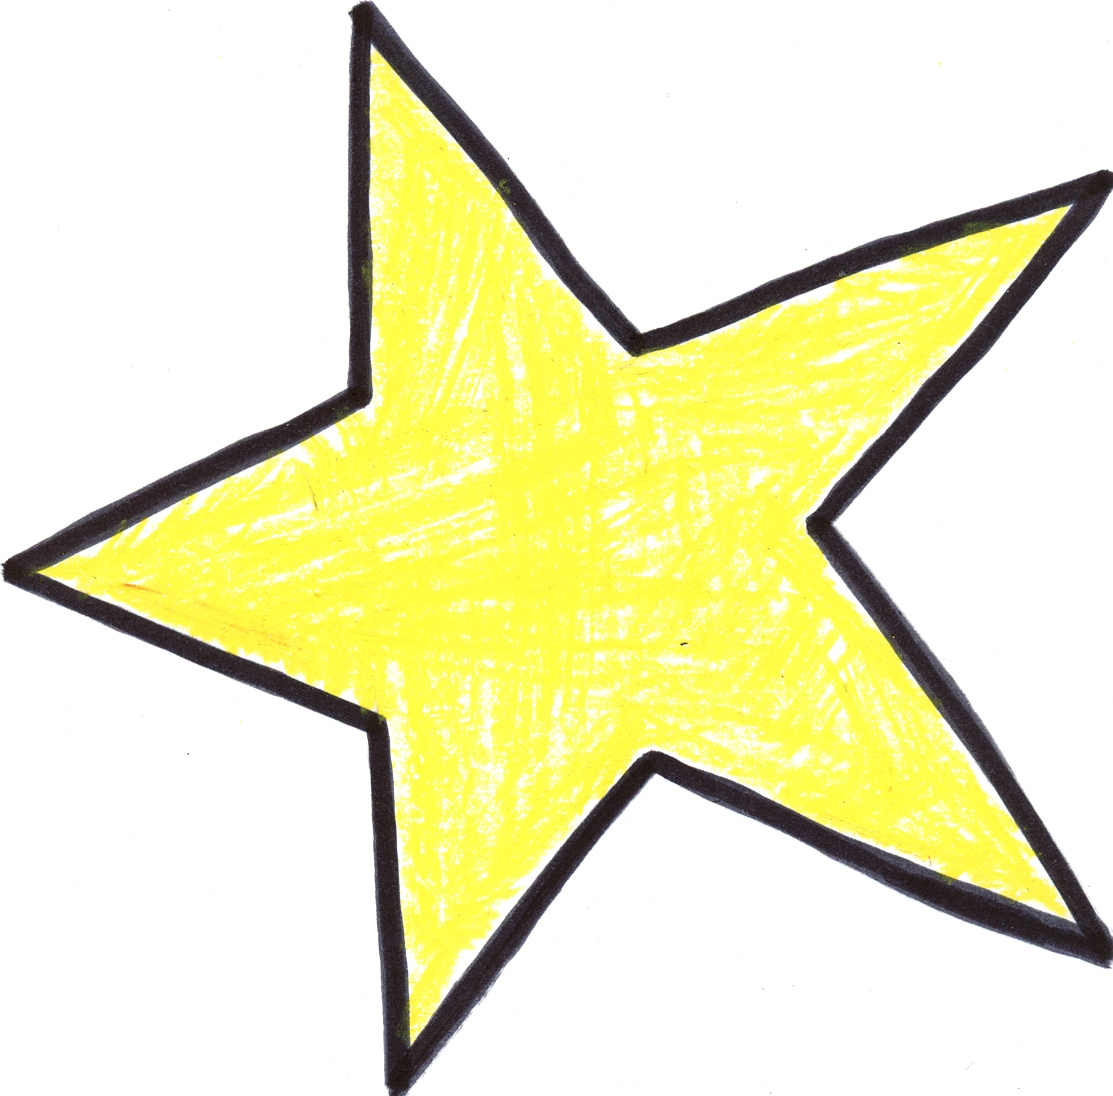 1113x1096 Stars Clip Art Free To Use Cliparts